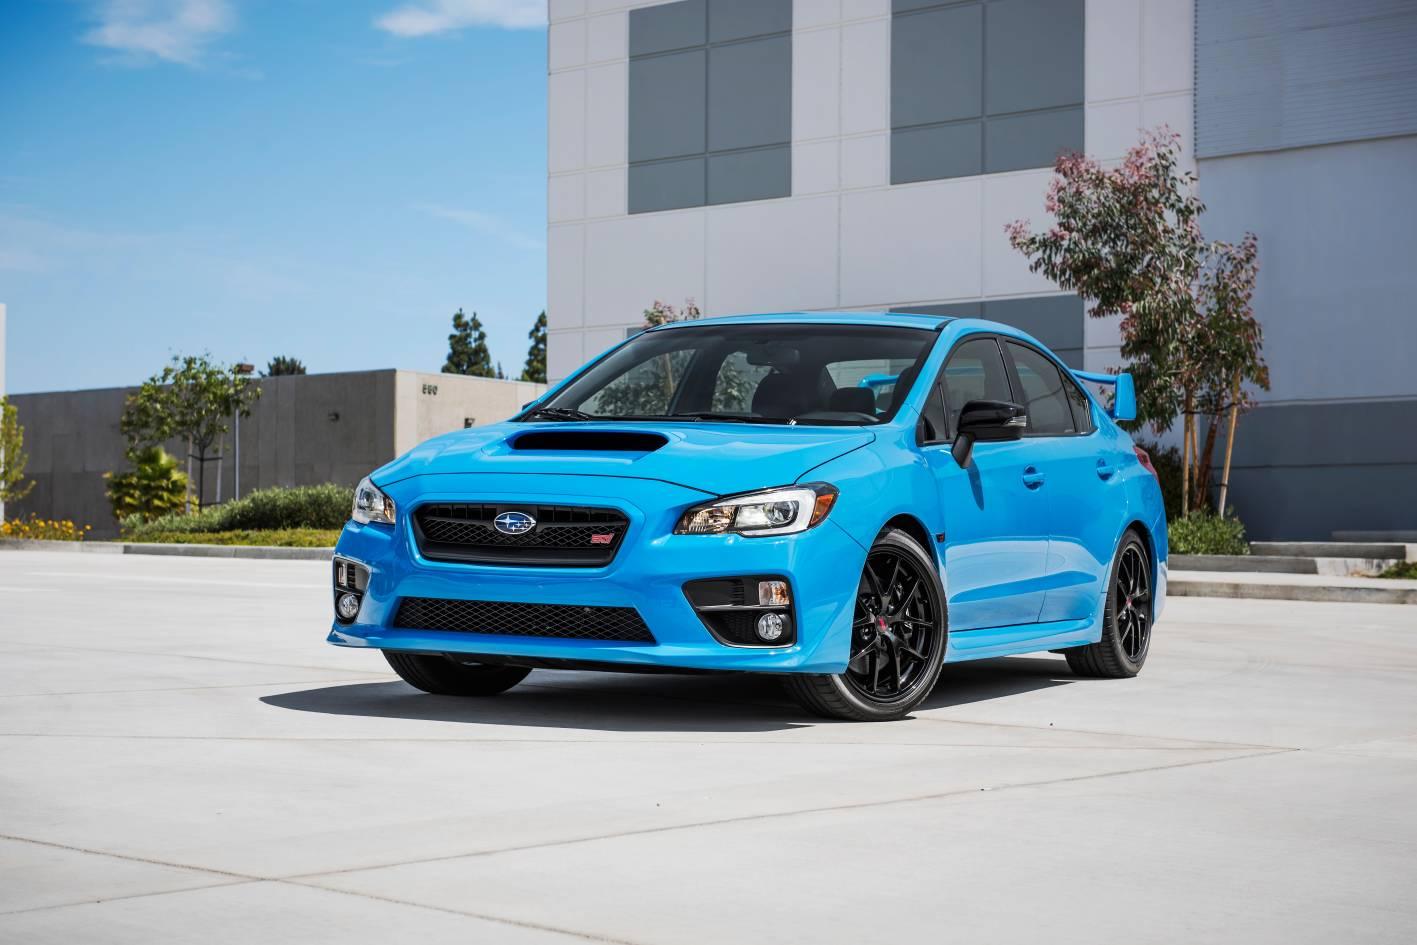 News Wrx Sti Premium And Brz Hyper Blue